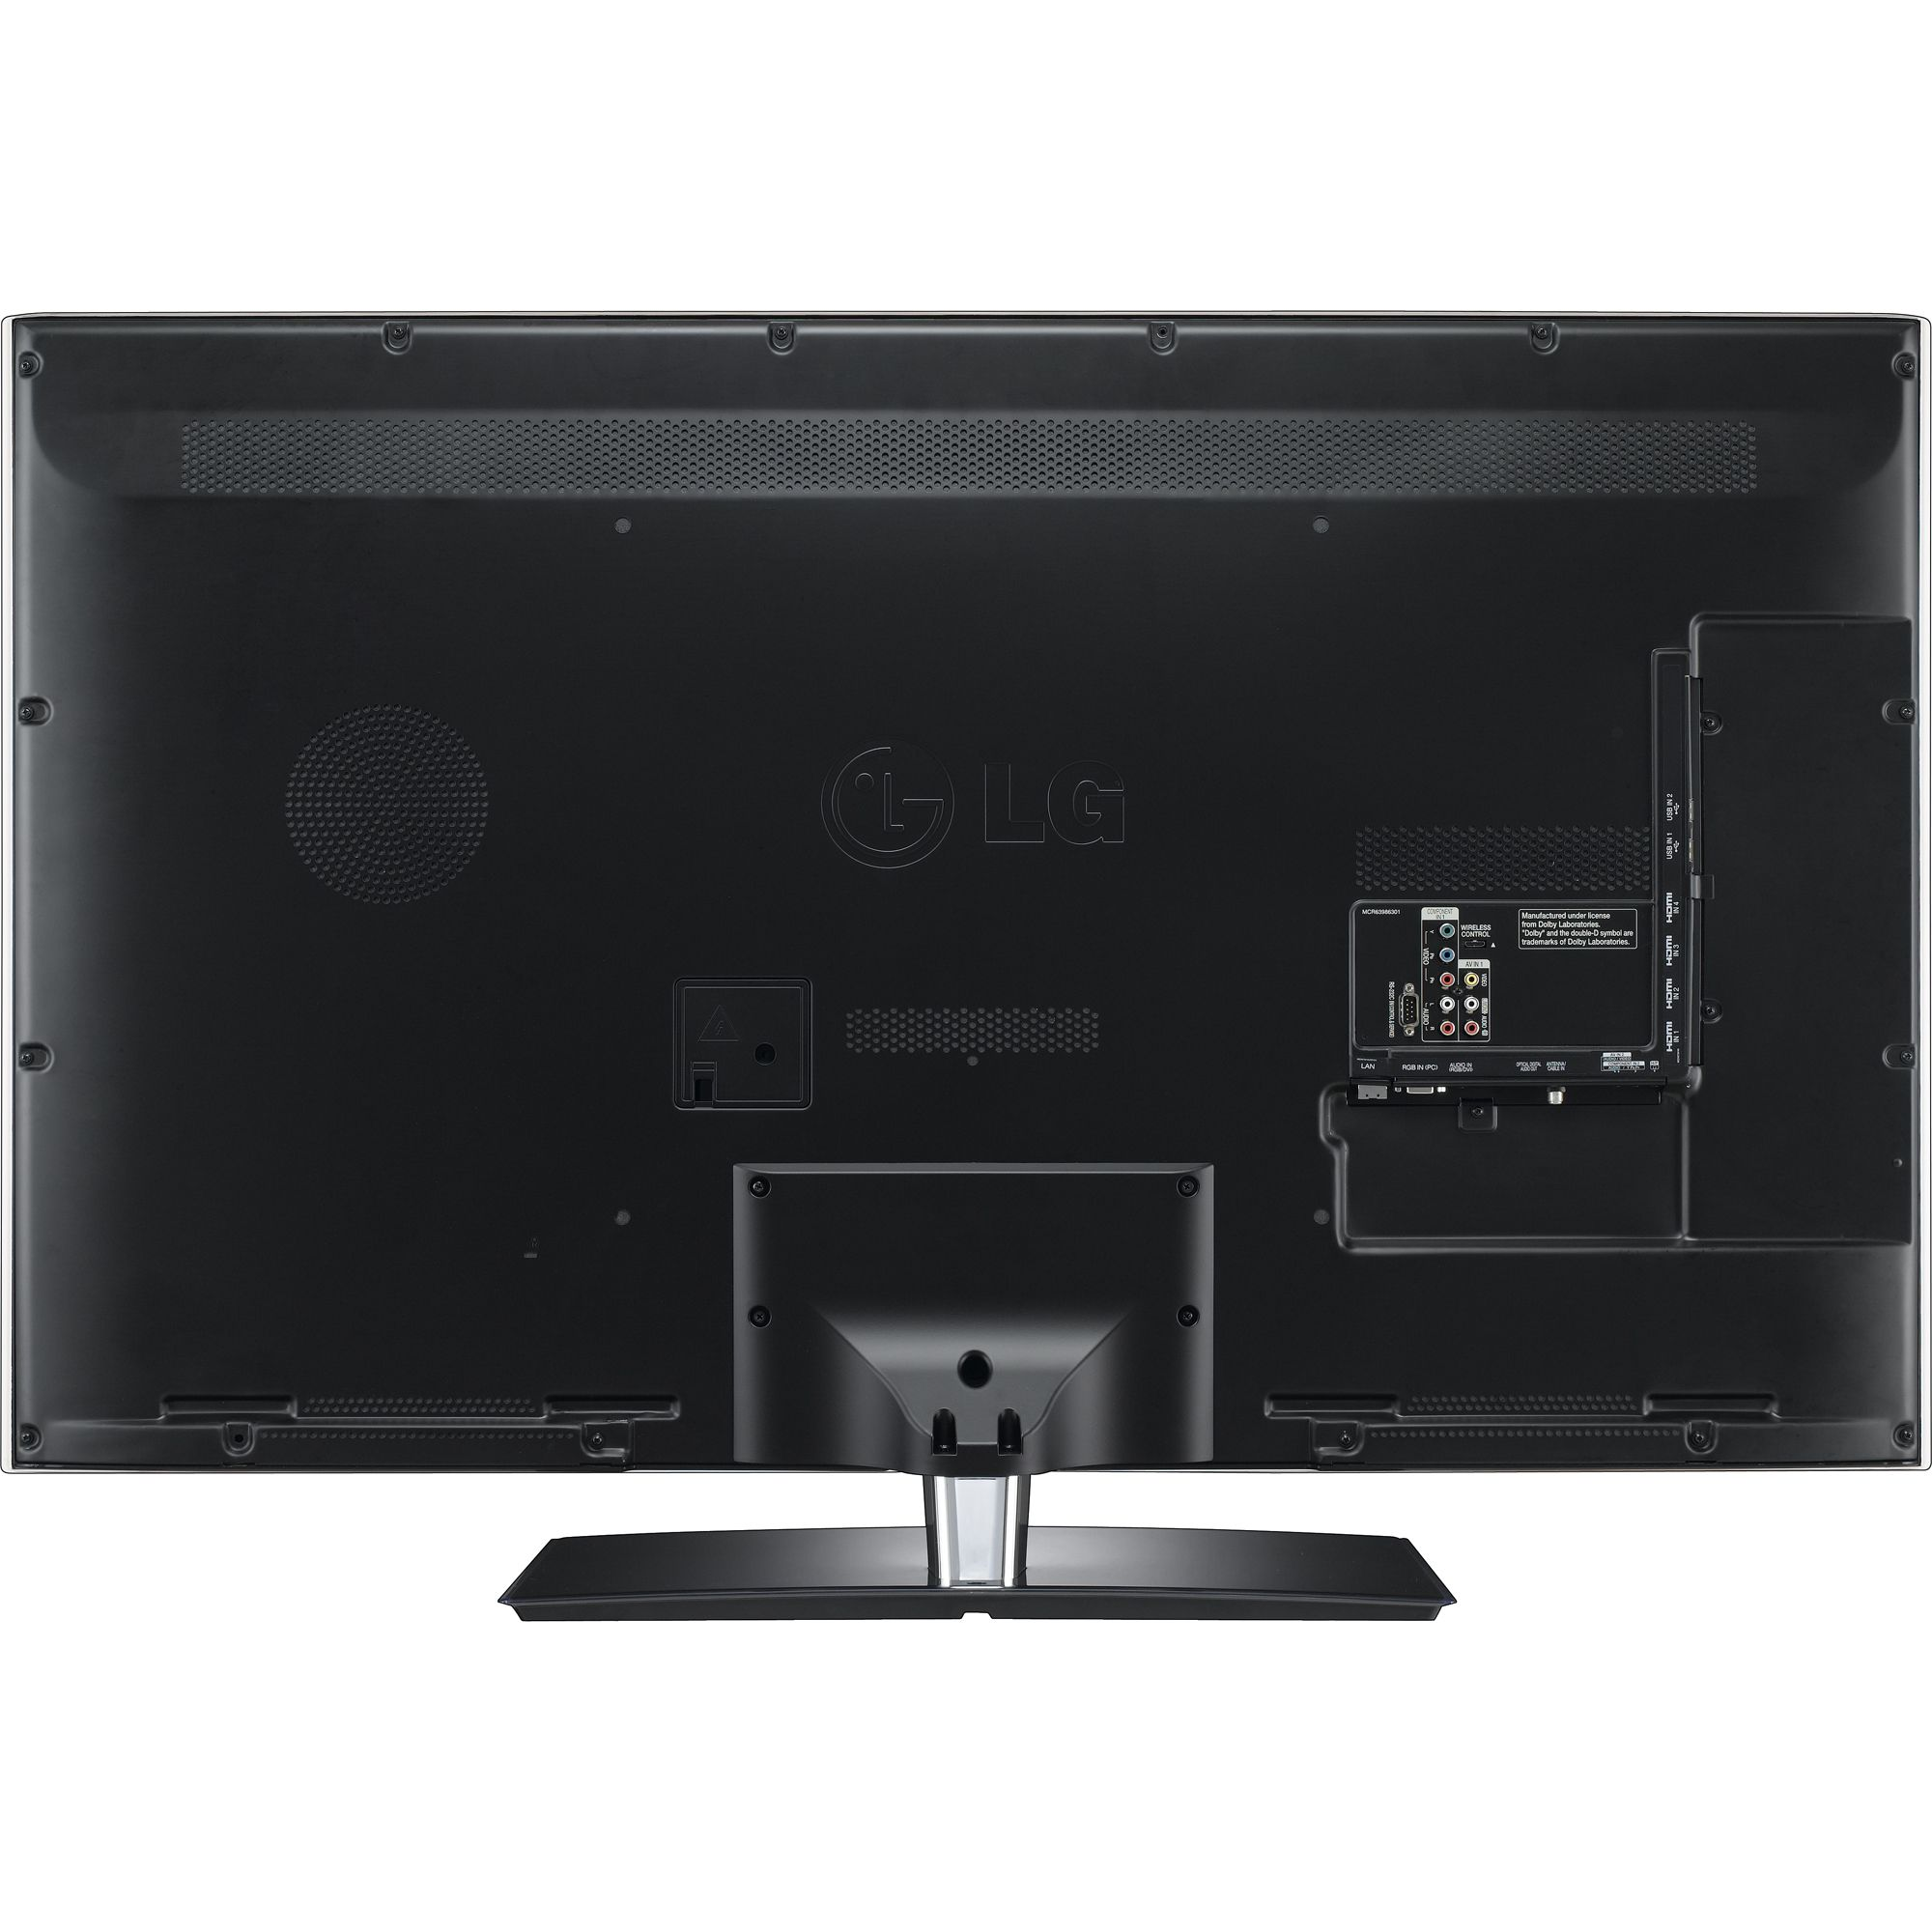 "LG (Refurbished) 55"" Class 1080p LED LCD TV"